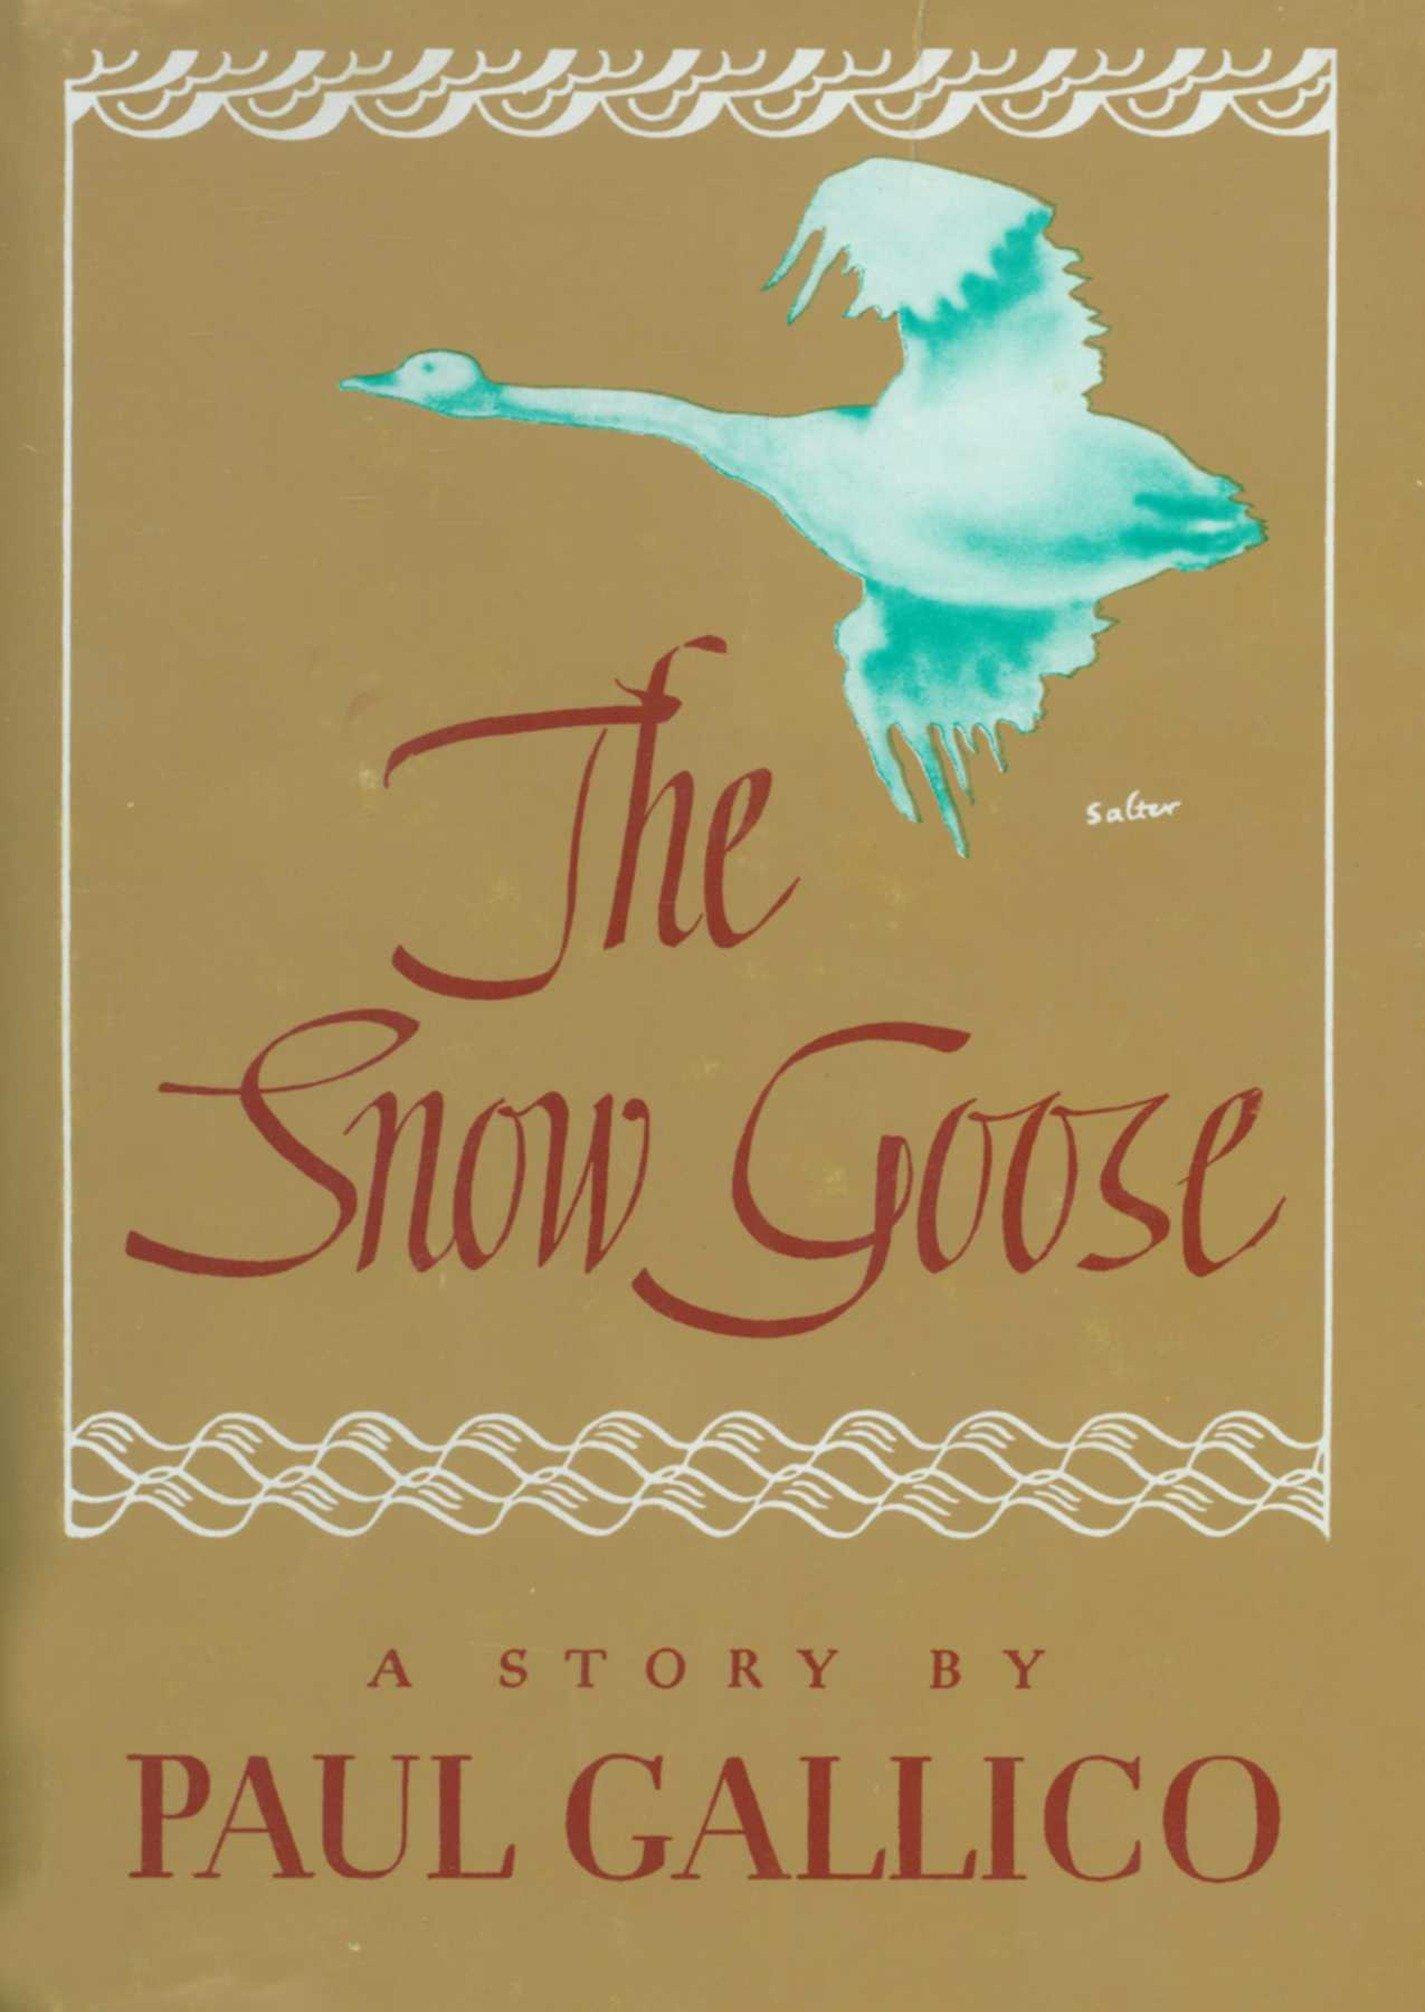 The Snow Goose ebook